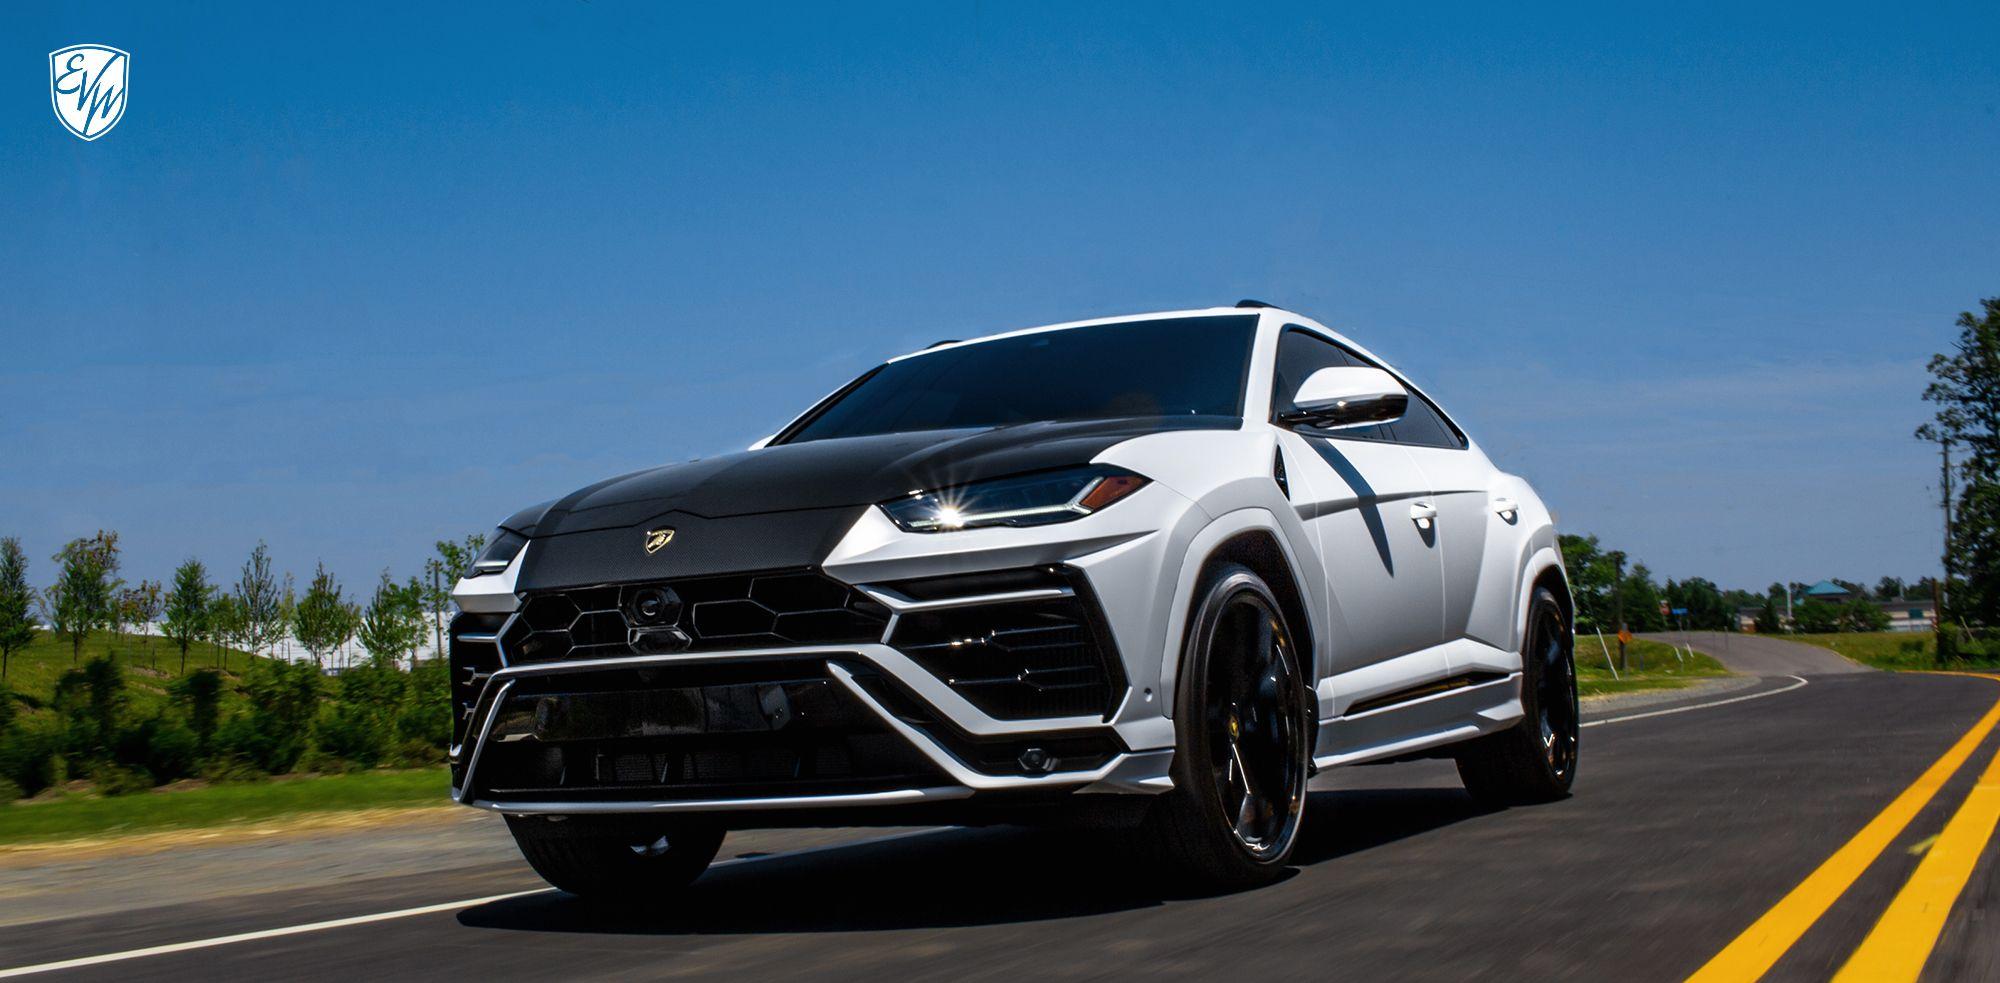 Lamborghini Urus Wrapped In Satin White With Carbon Fiber Accents White Lamborghini Lamborghini Bmw Car